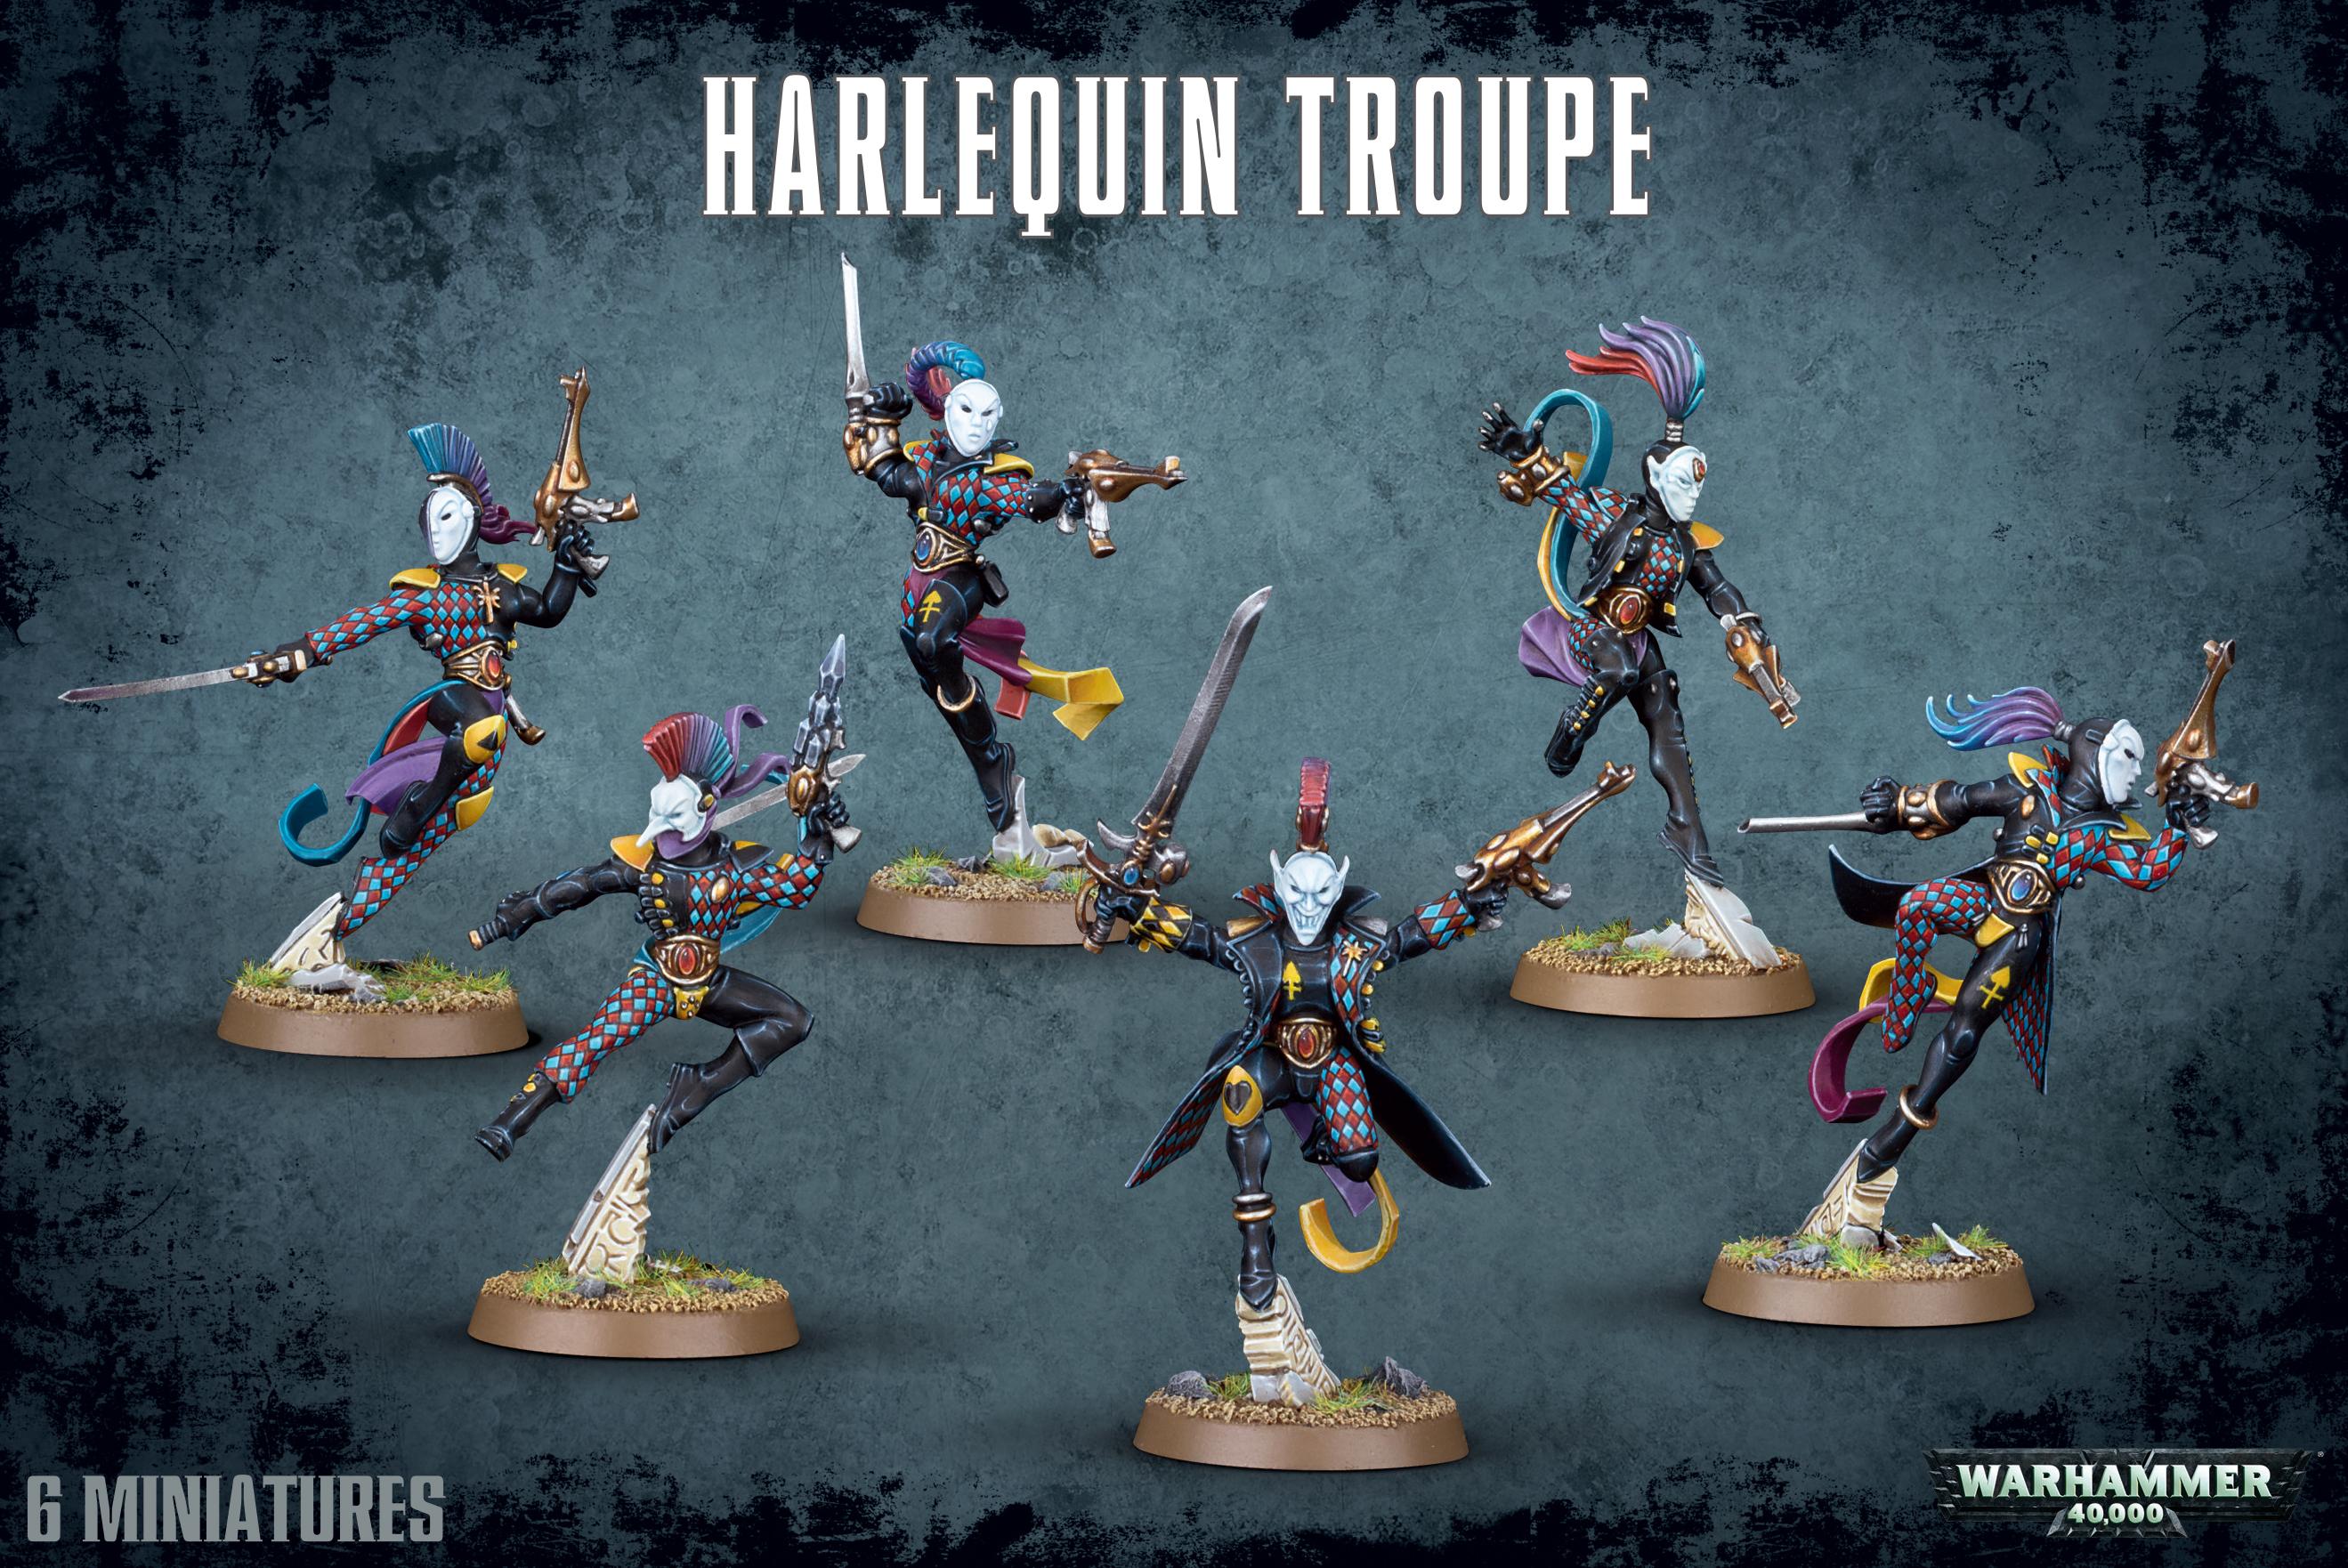 Harlequin Troupe